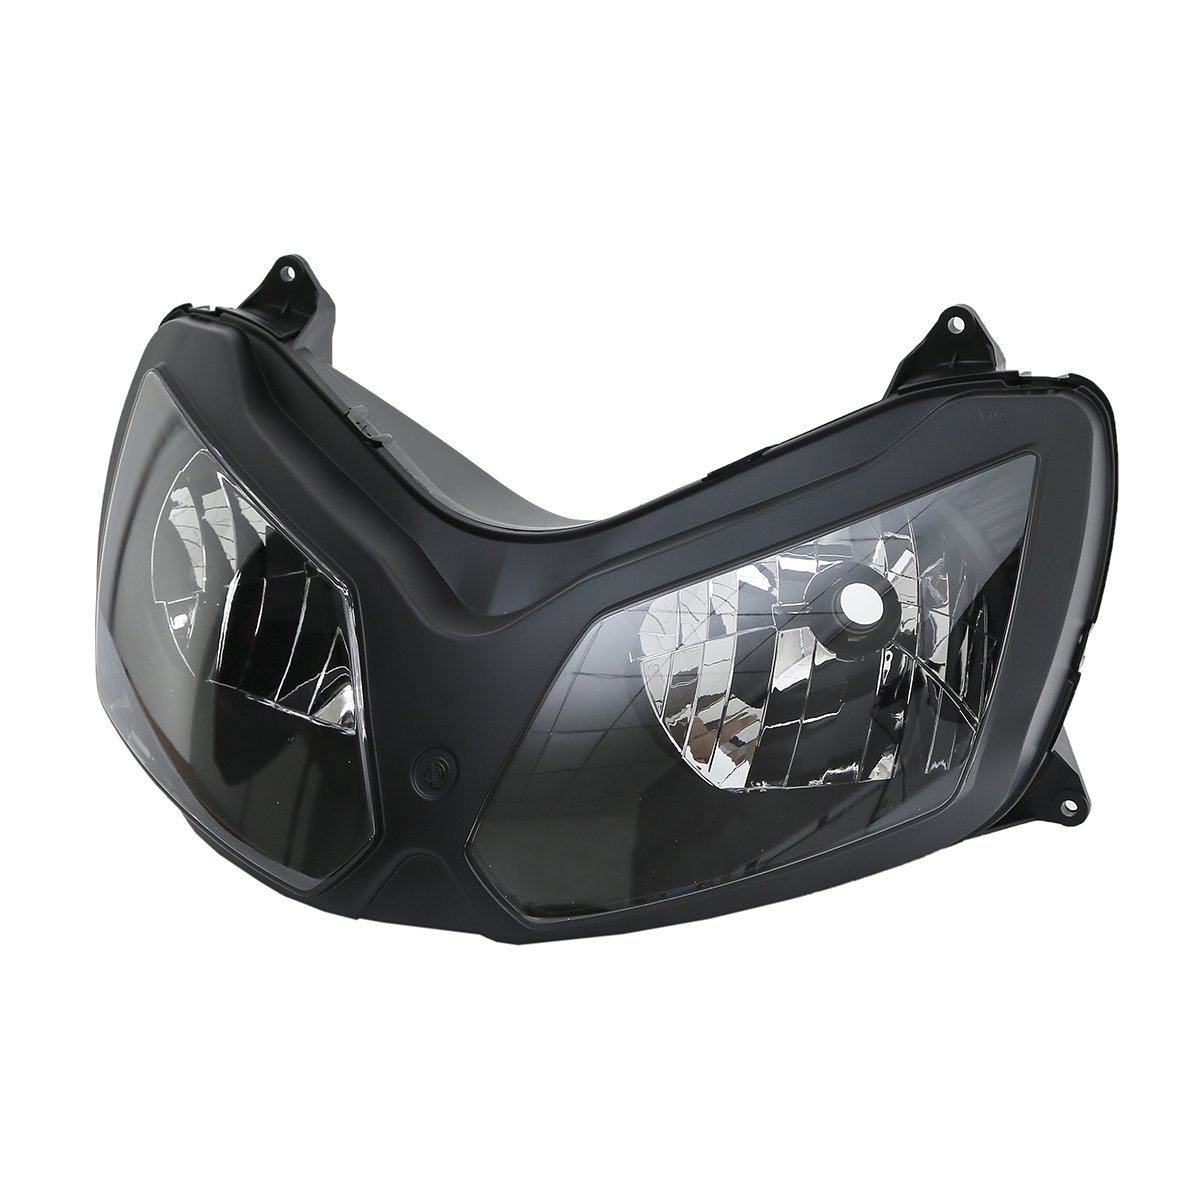 XFMT Front Headlight Headlamp Assembly Compatible with Kawasaki Ninja ZX12R ZX 12R 02-05 03 04